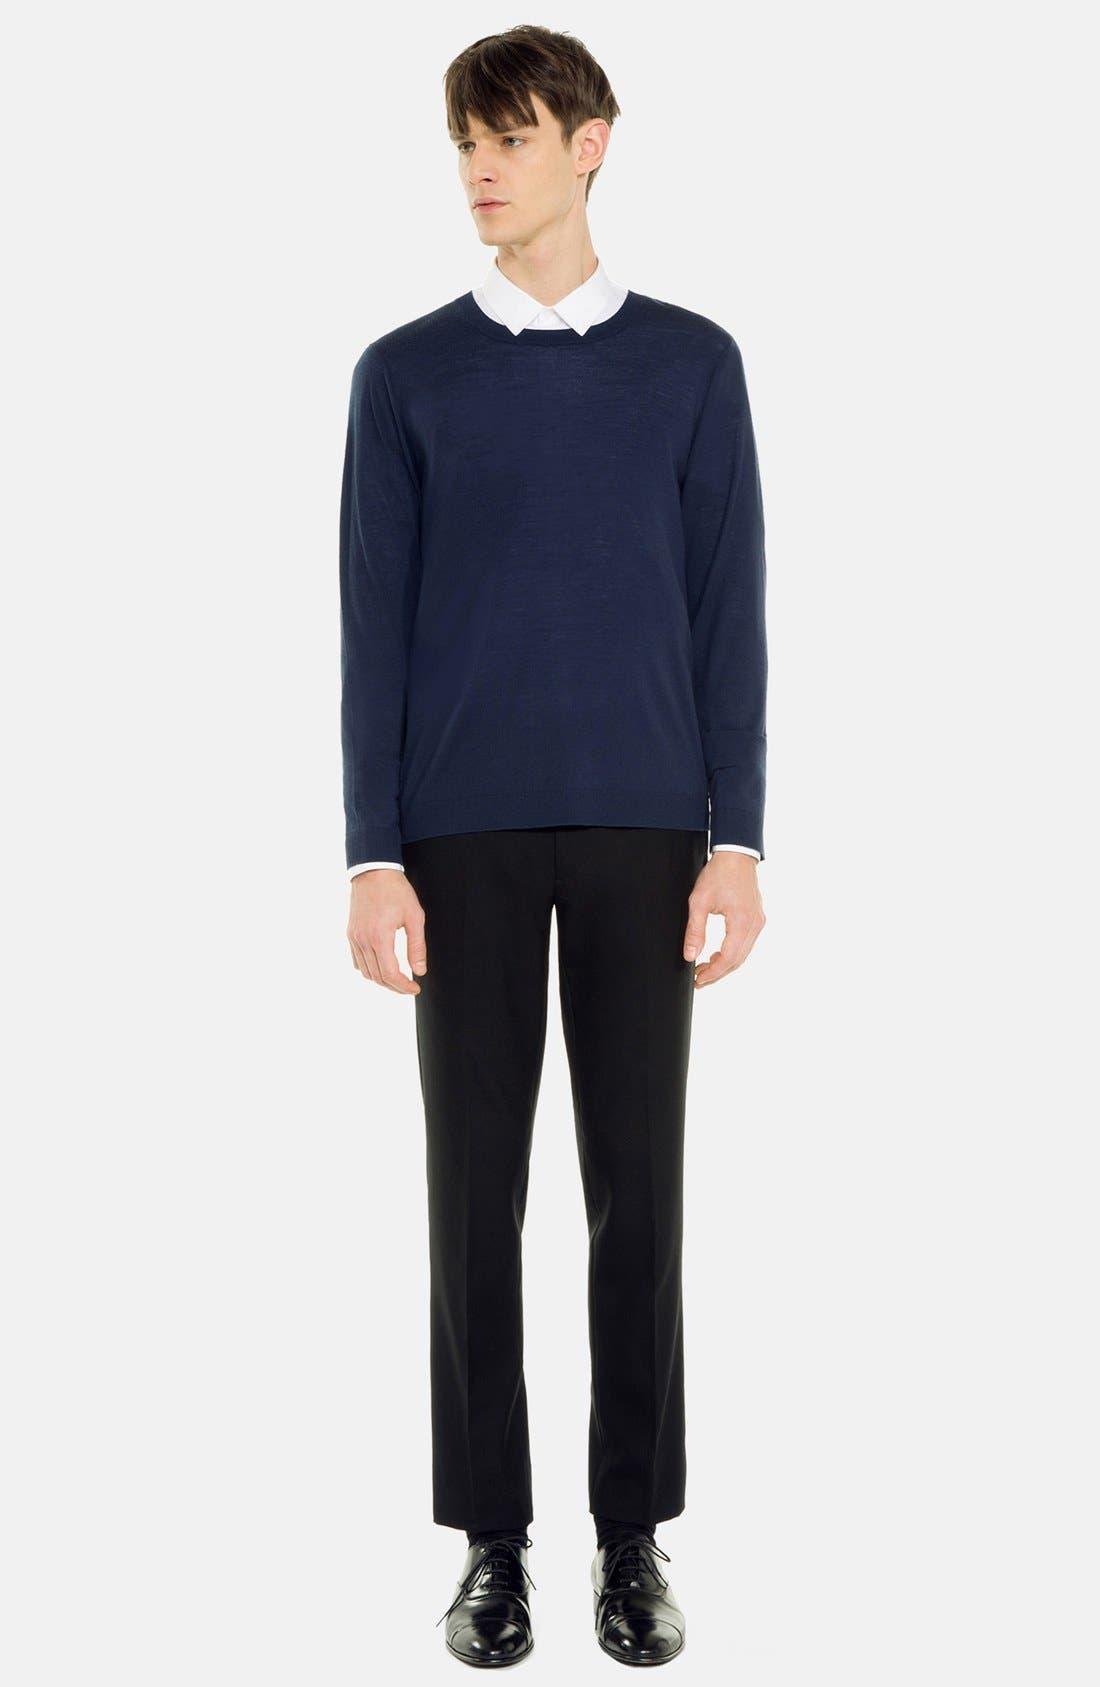 Alternate Image 1 Selected - sandro 'Birdy' Merino Wool Sweater